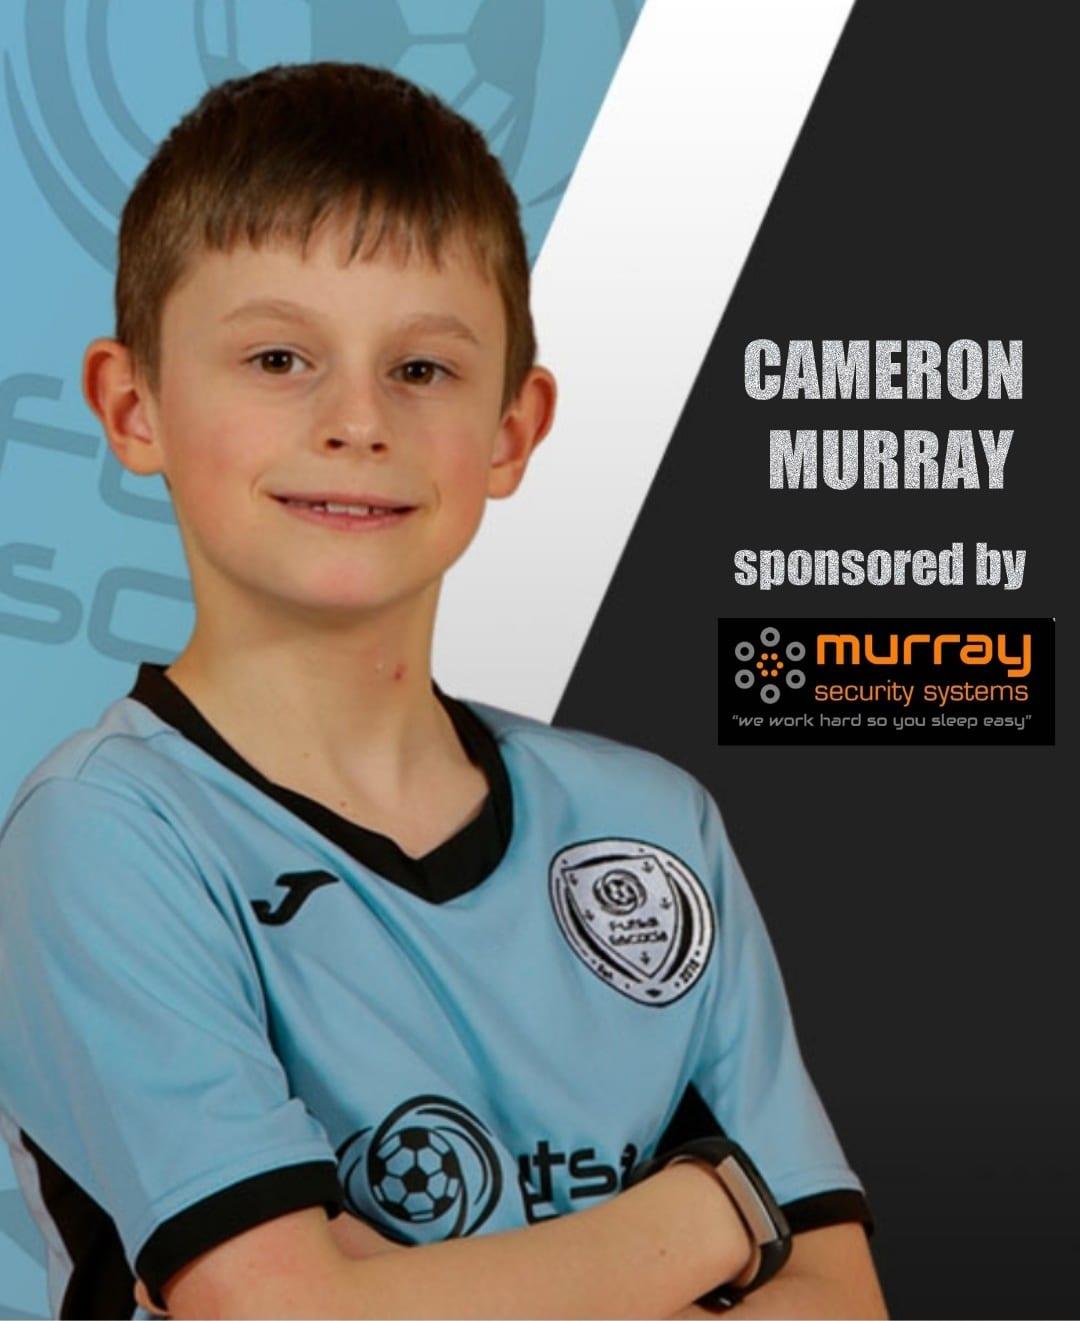 Cameron Murray